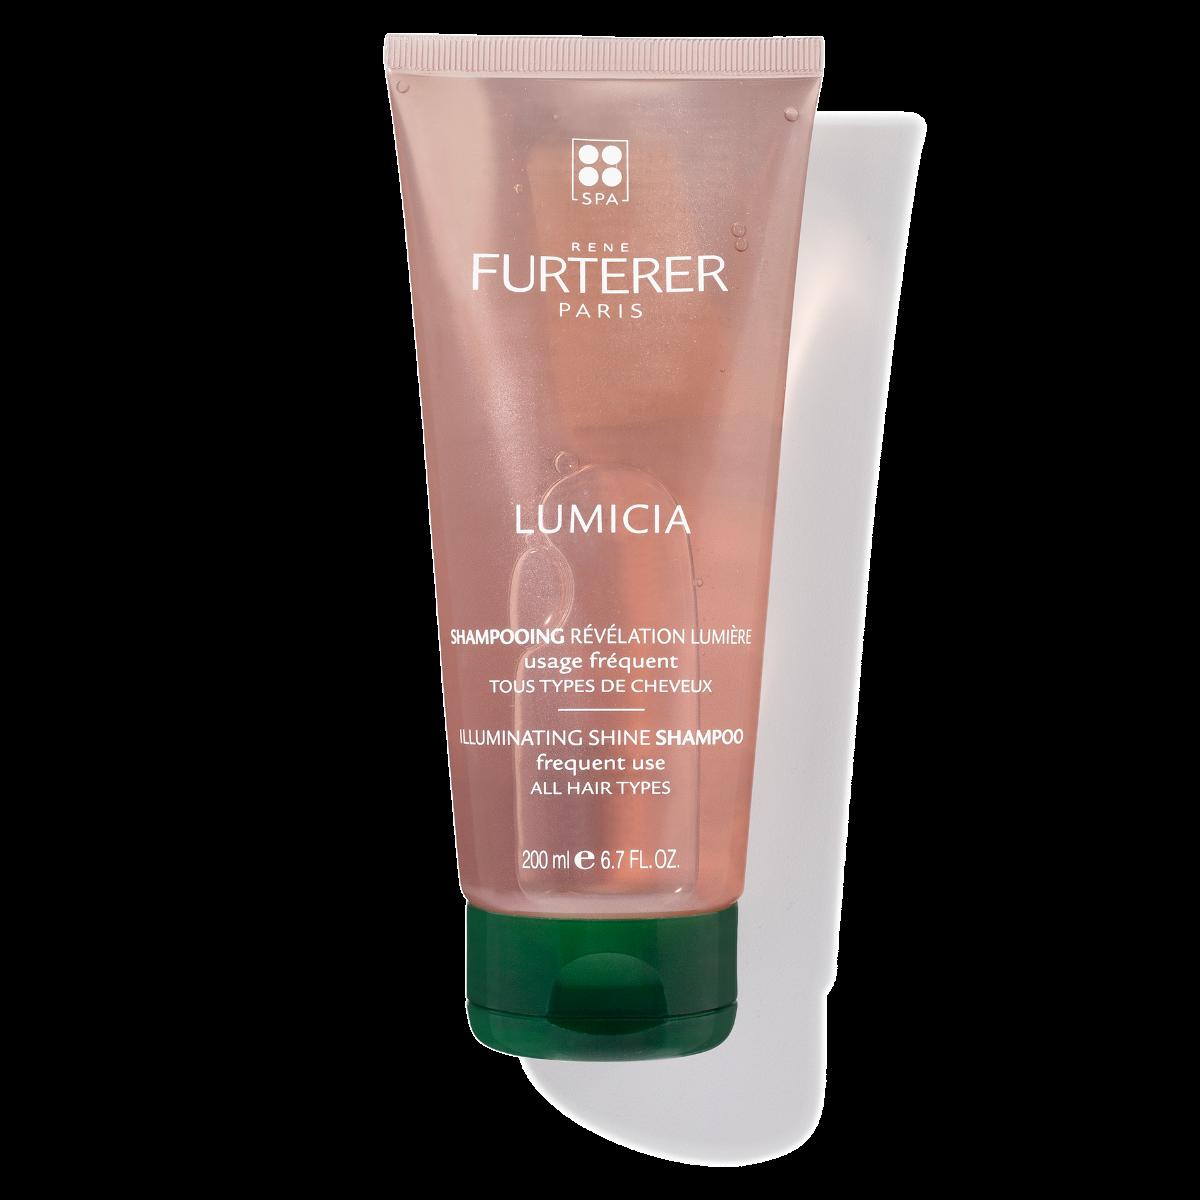 Rene Furterer LUMICIA Illuminating Shine Shampoo